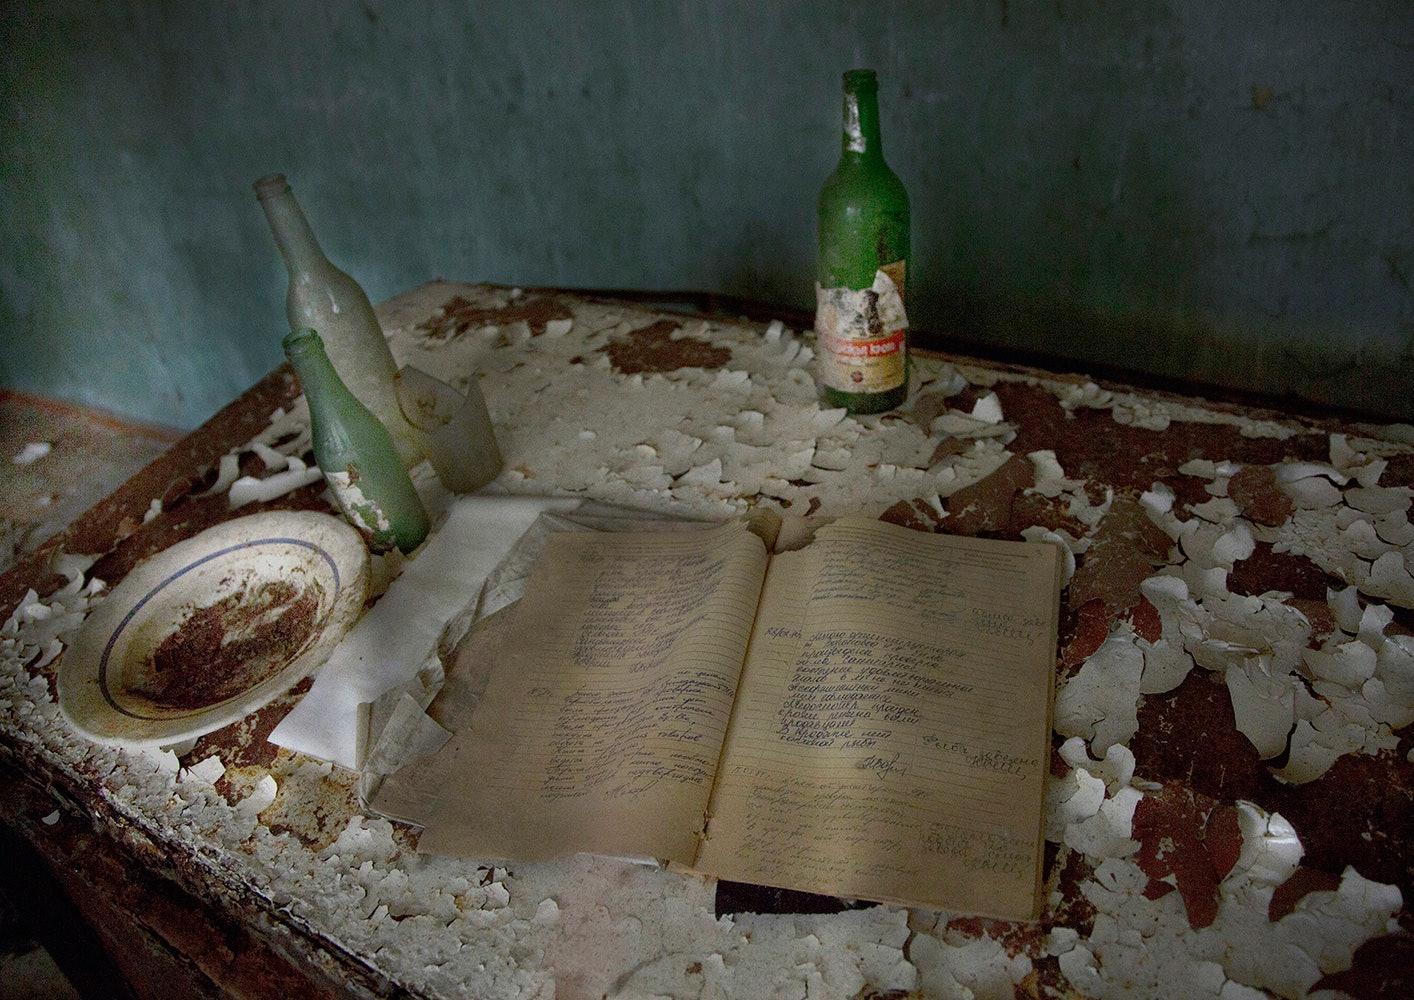 Quintina-Valero-Chernobyl_04